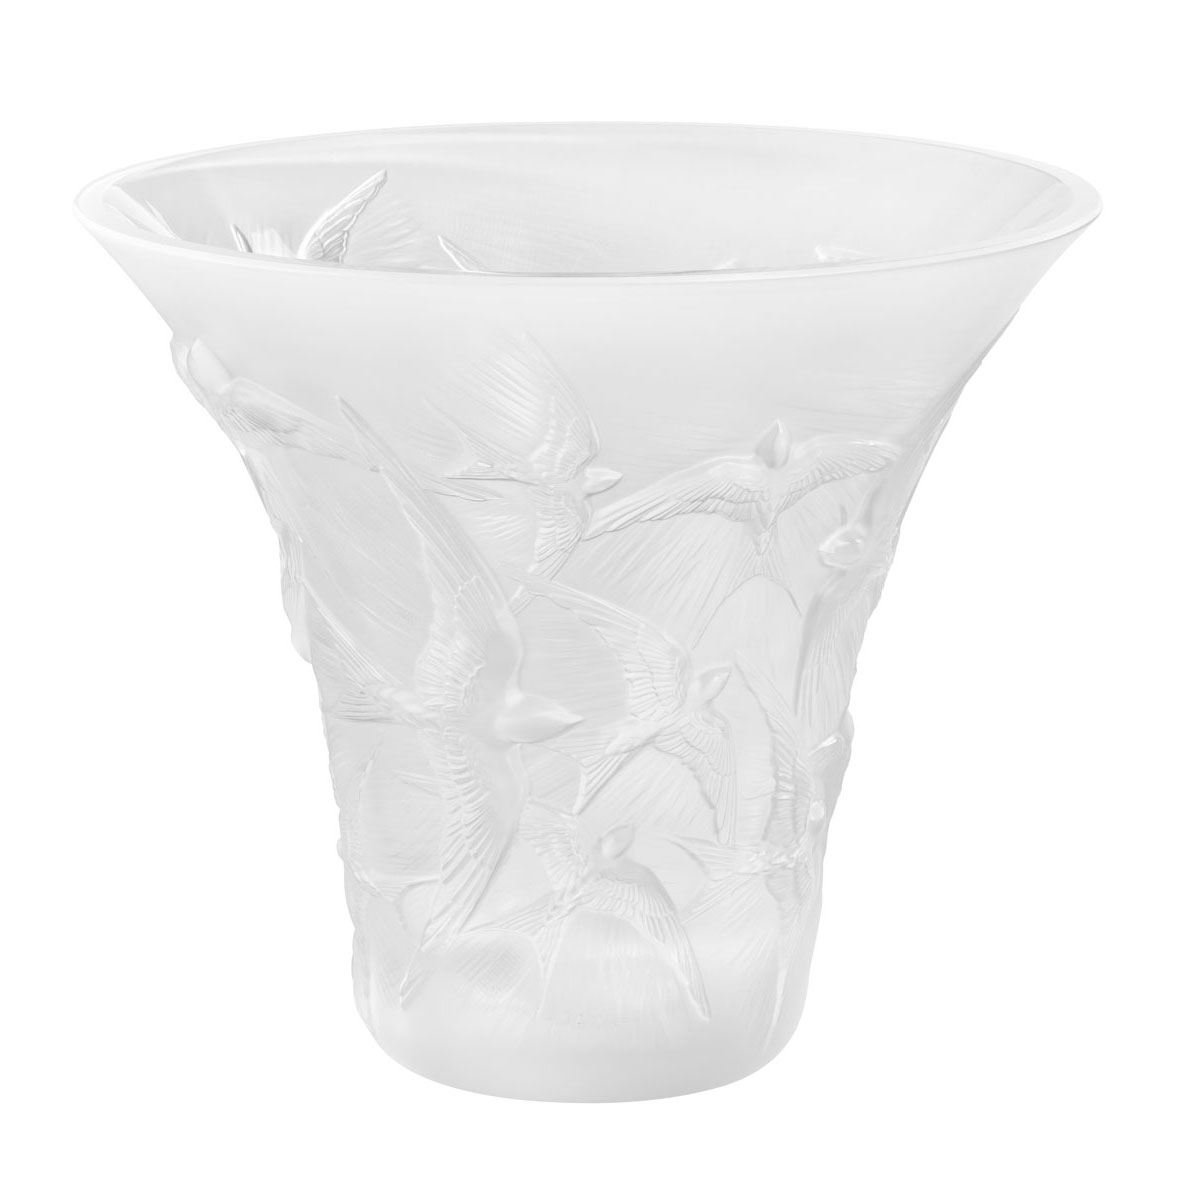 "Lalique Hirondelles 11 1/2"" Flared Vase, Clear"